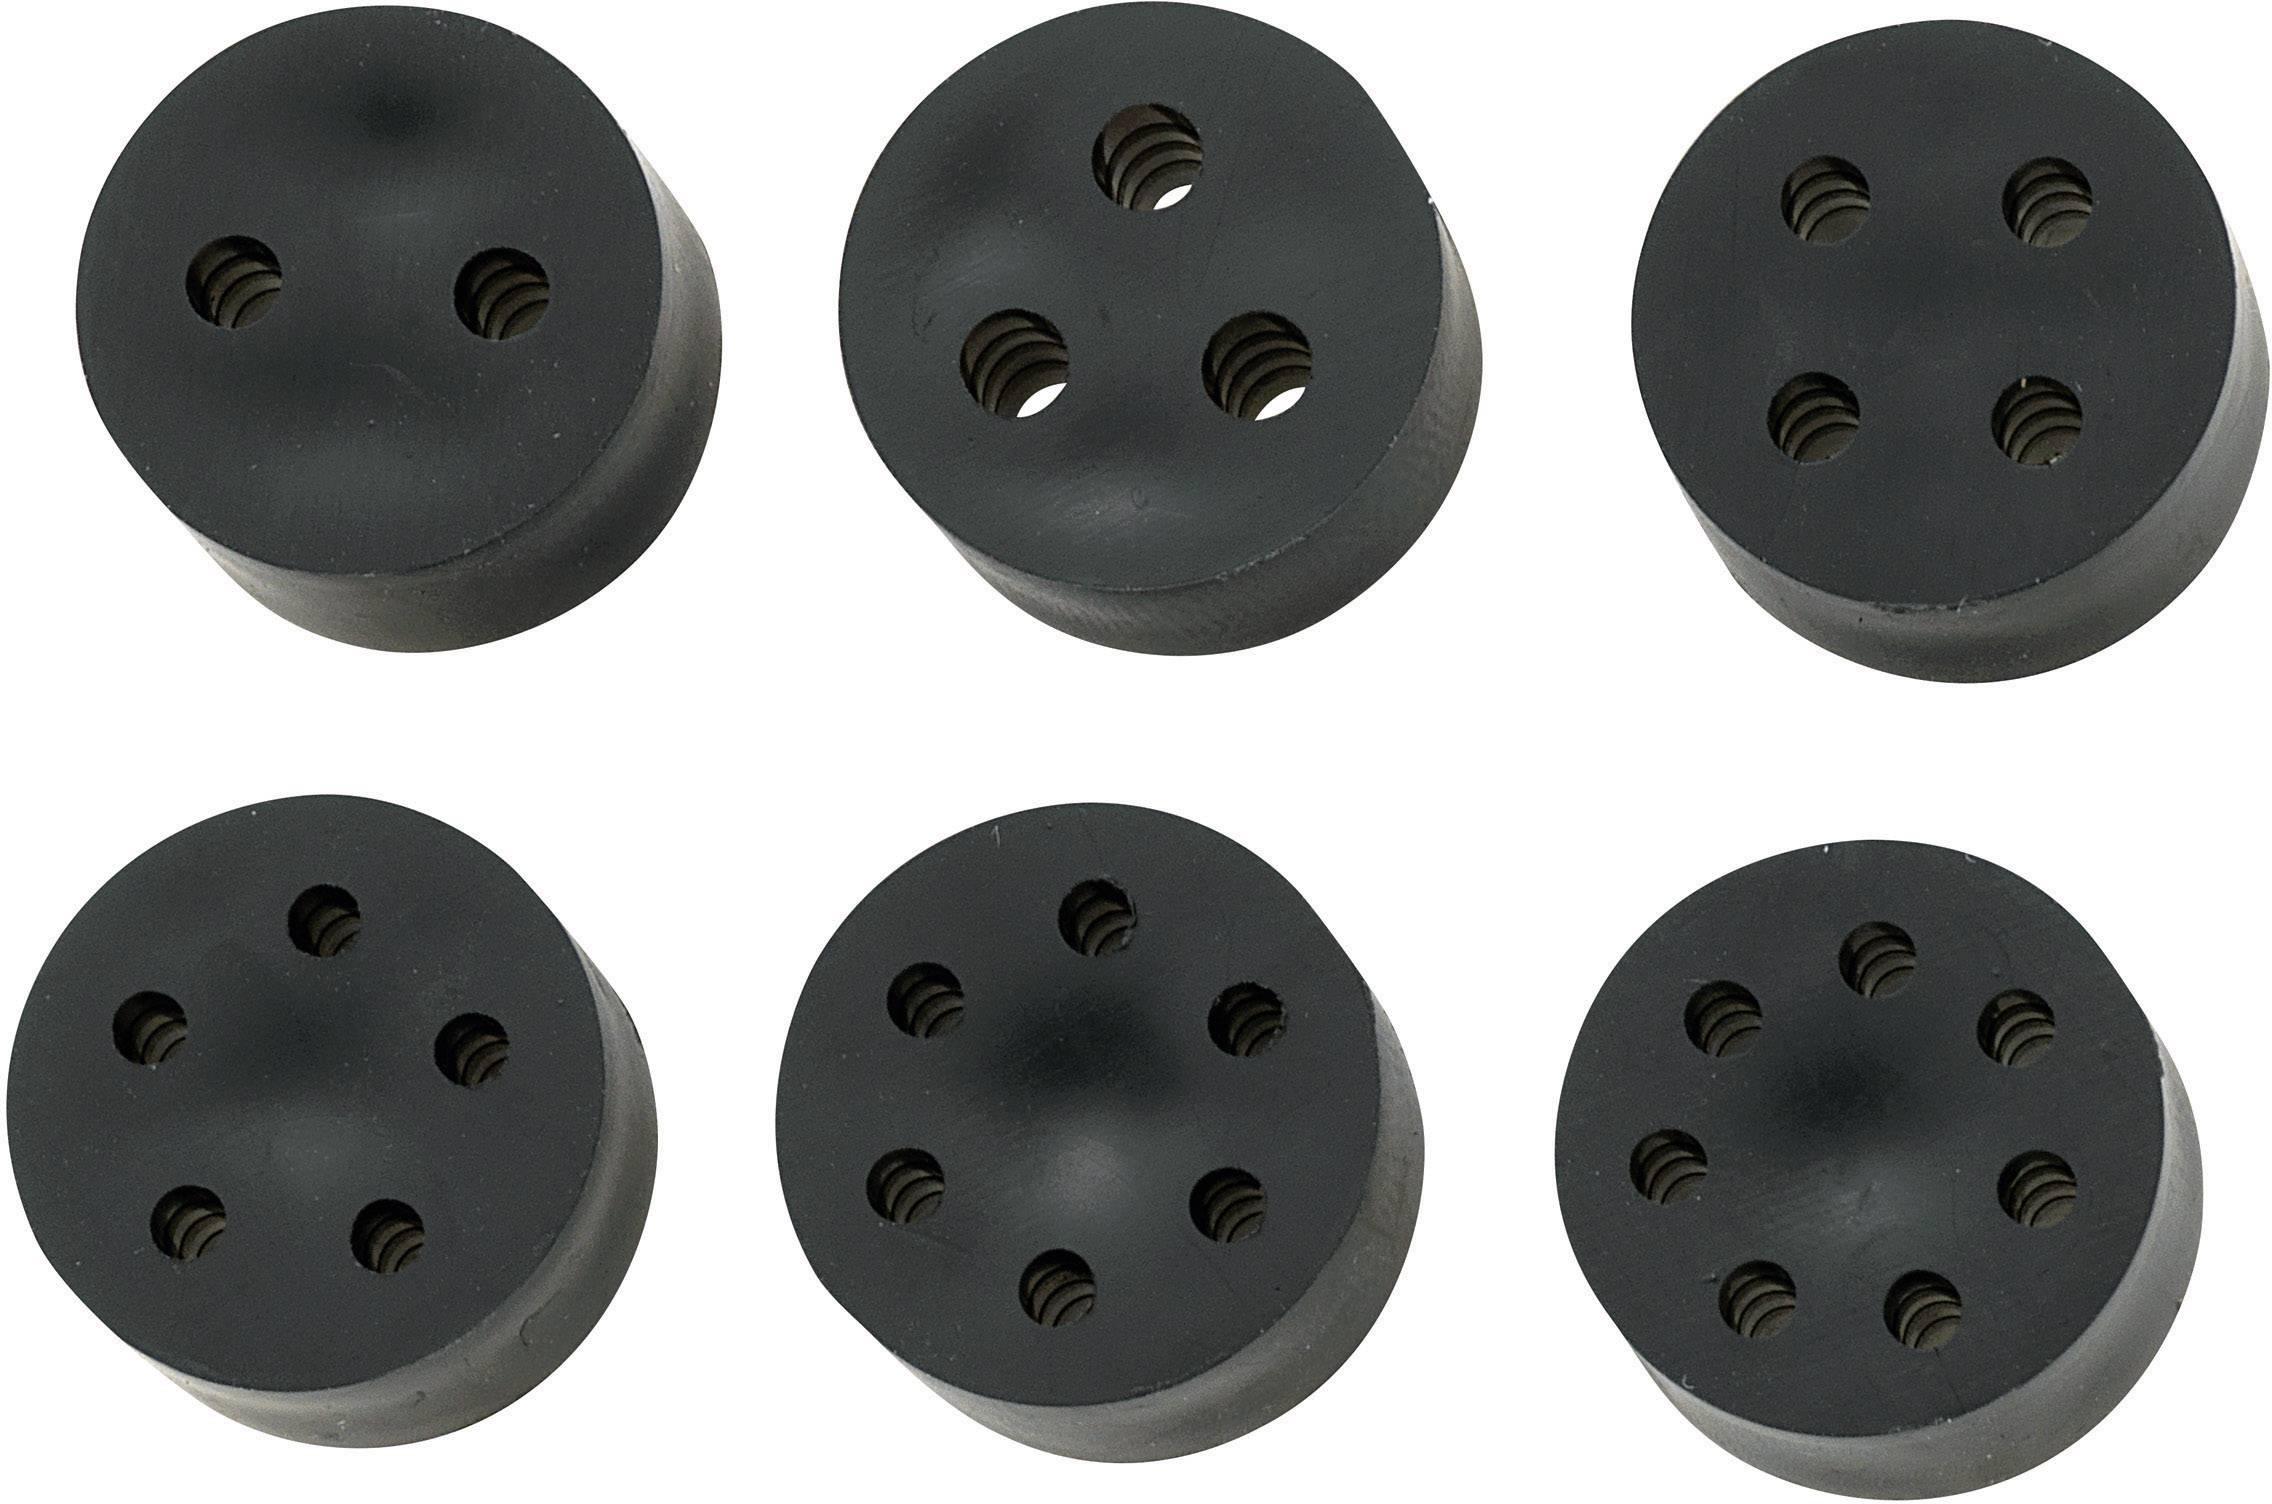 Tesniaca vložka s viacerými priechodmi KSS MH23-3D, PG21, guma, 1 ks